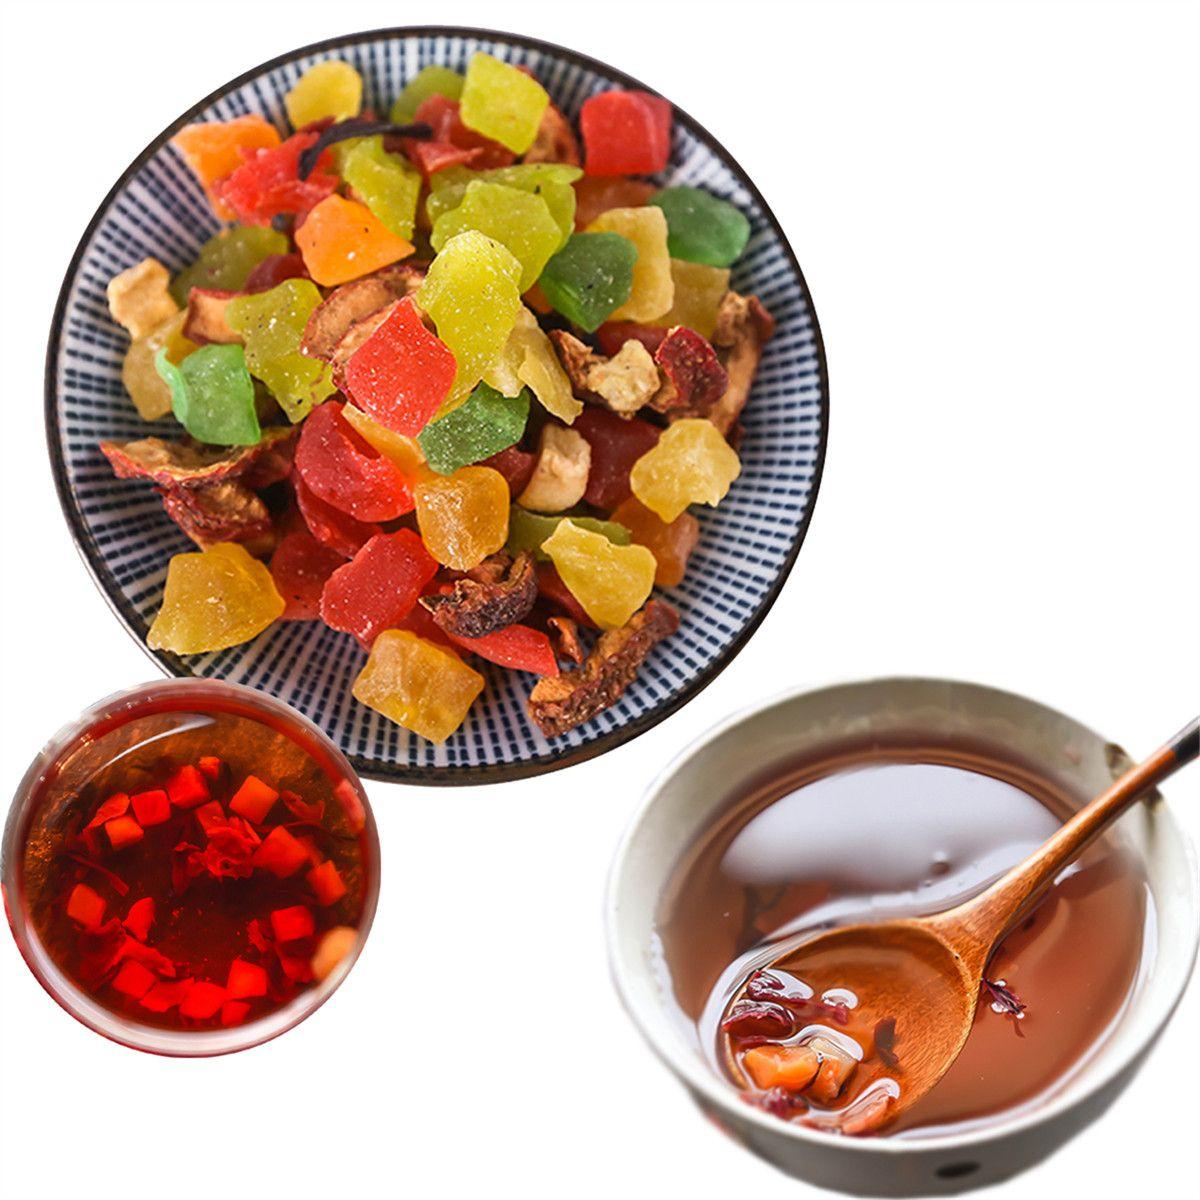 Roselle Flower Mixed Fruit Grain Tea Dry Fresh Handmade Luoshen Flower Новый Ароматизированный Чай Здоровая Зеленая Пища Оптом